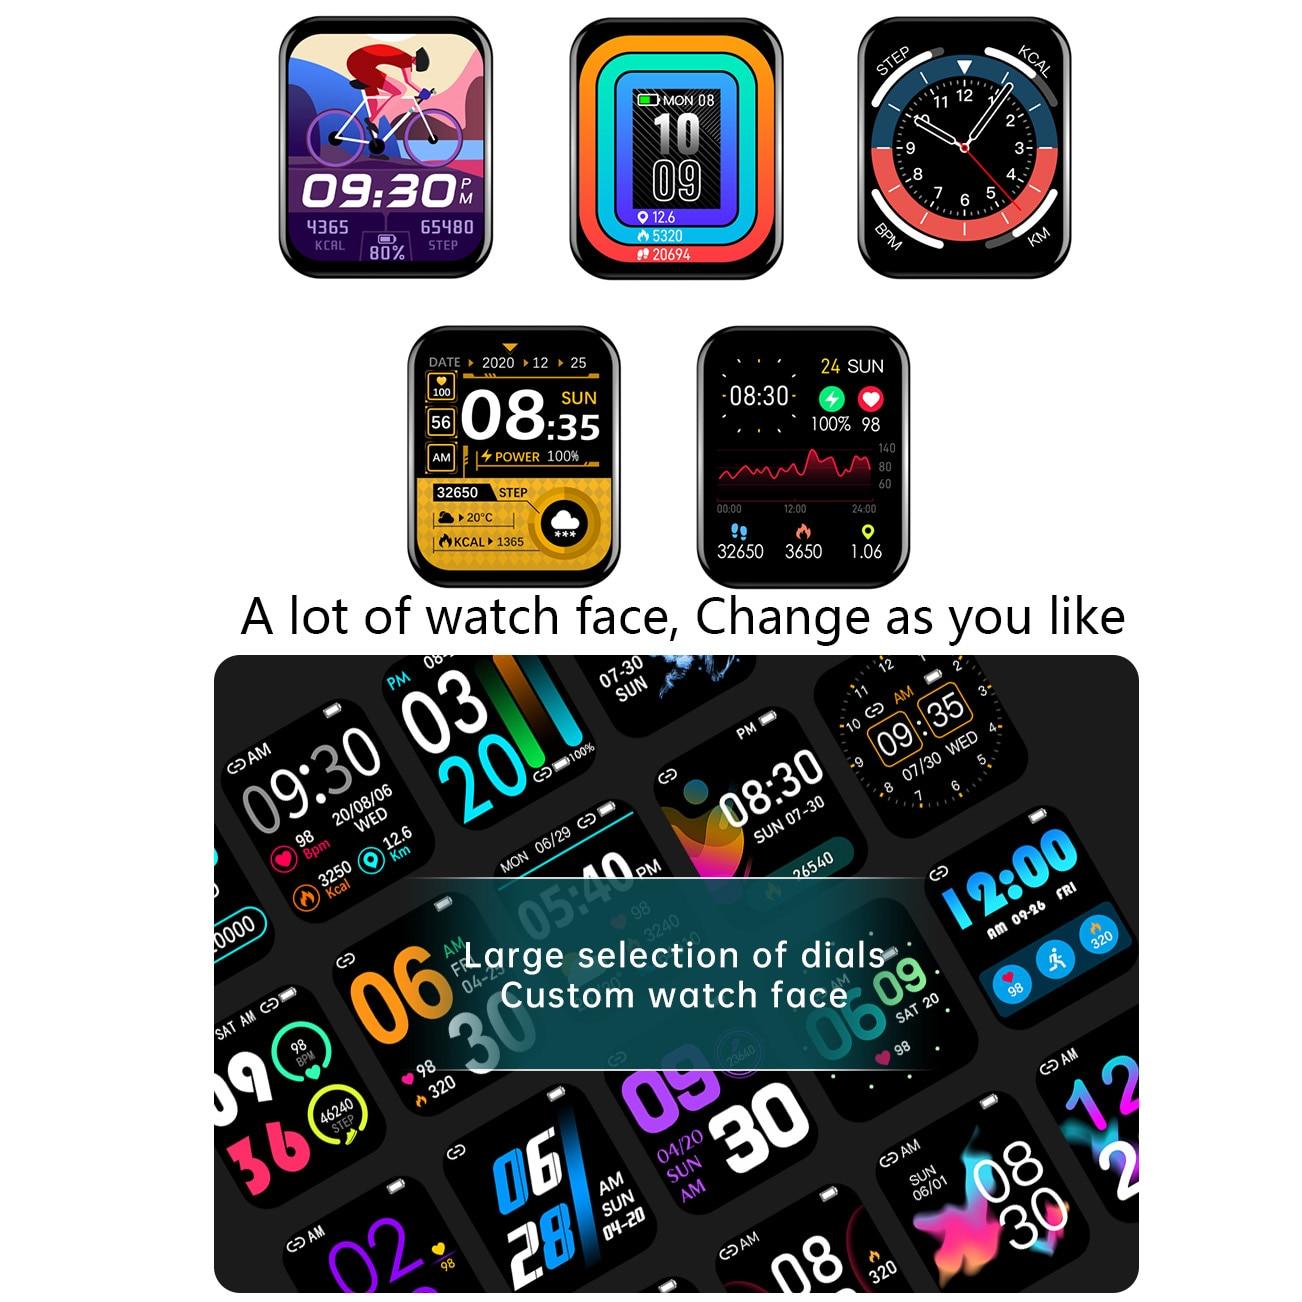 Reloj Inteligente Mujer Smartwatch Android Men 2021 Smart Watch Man Bluetooth Call Smartwatch Women For Xiaomi Reloj Inteligente Mujer Smartwatch Android Men 2021 Smart Watch Man Bluetooth Call Smartwatch Women For Xiaomi Mi Phone GTS 2